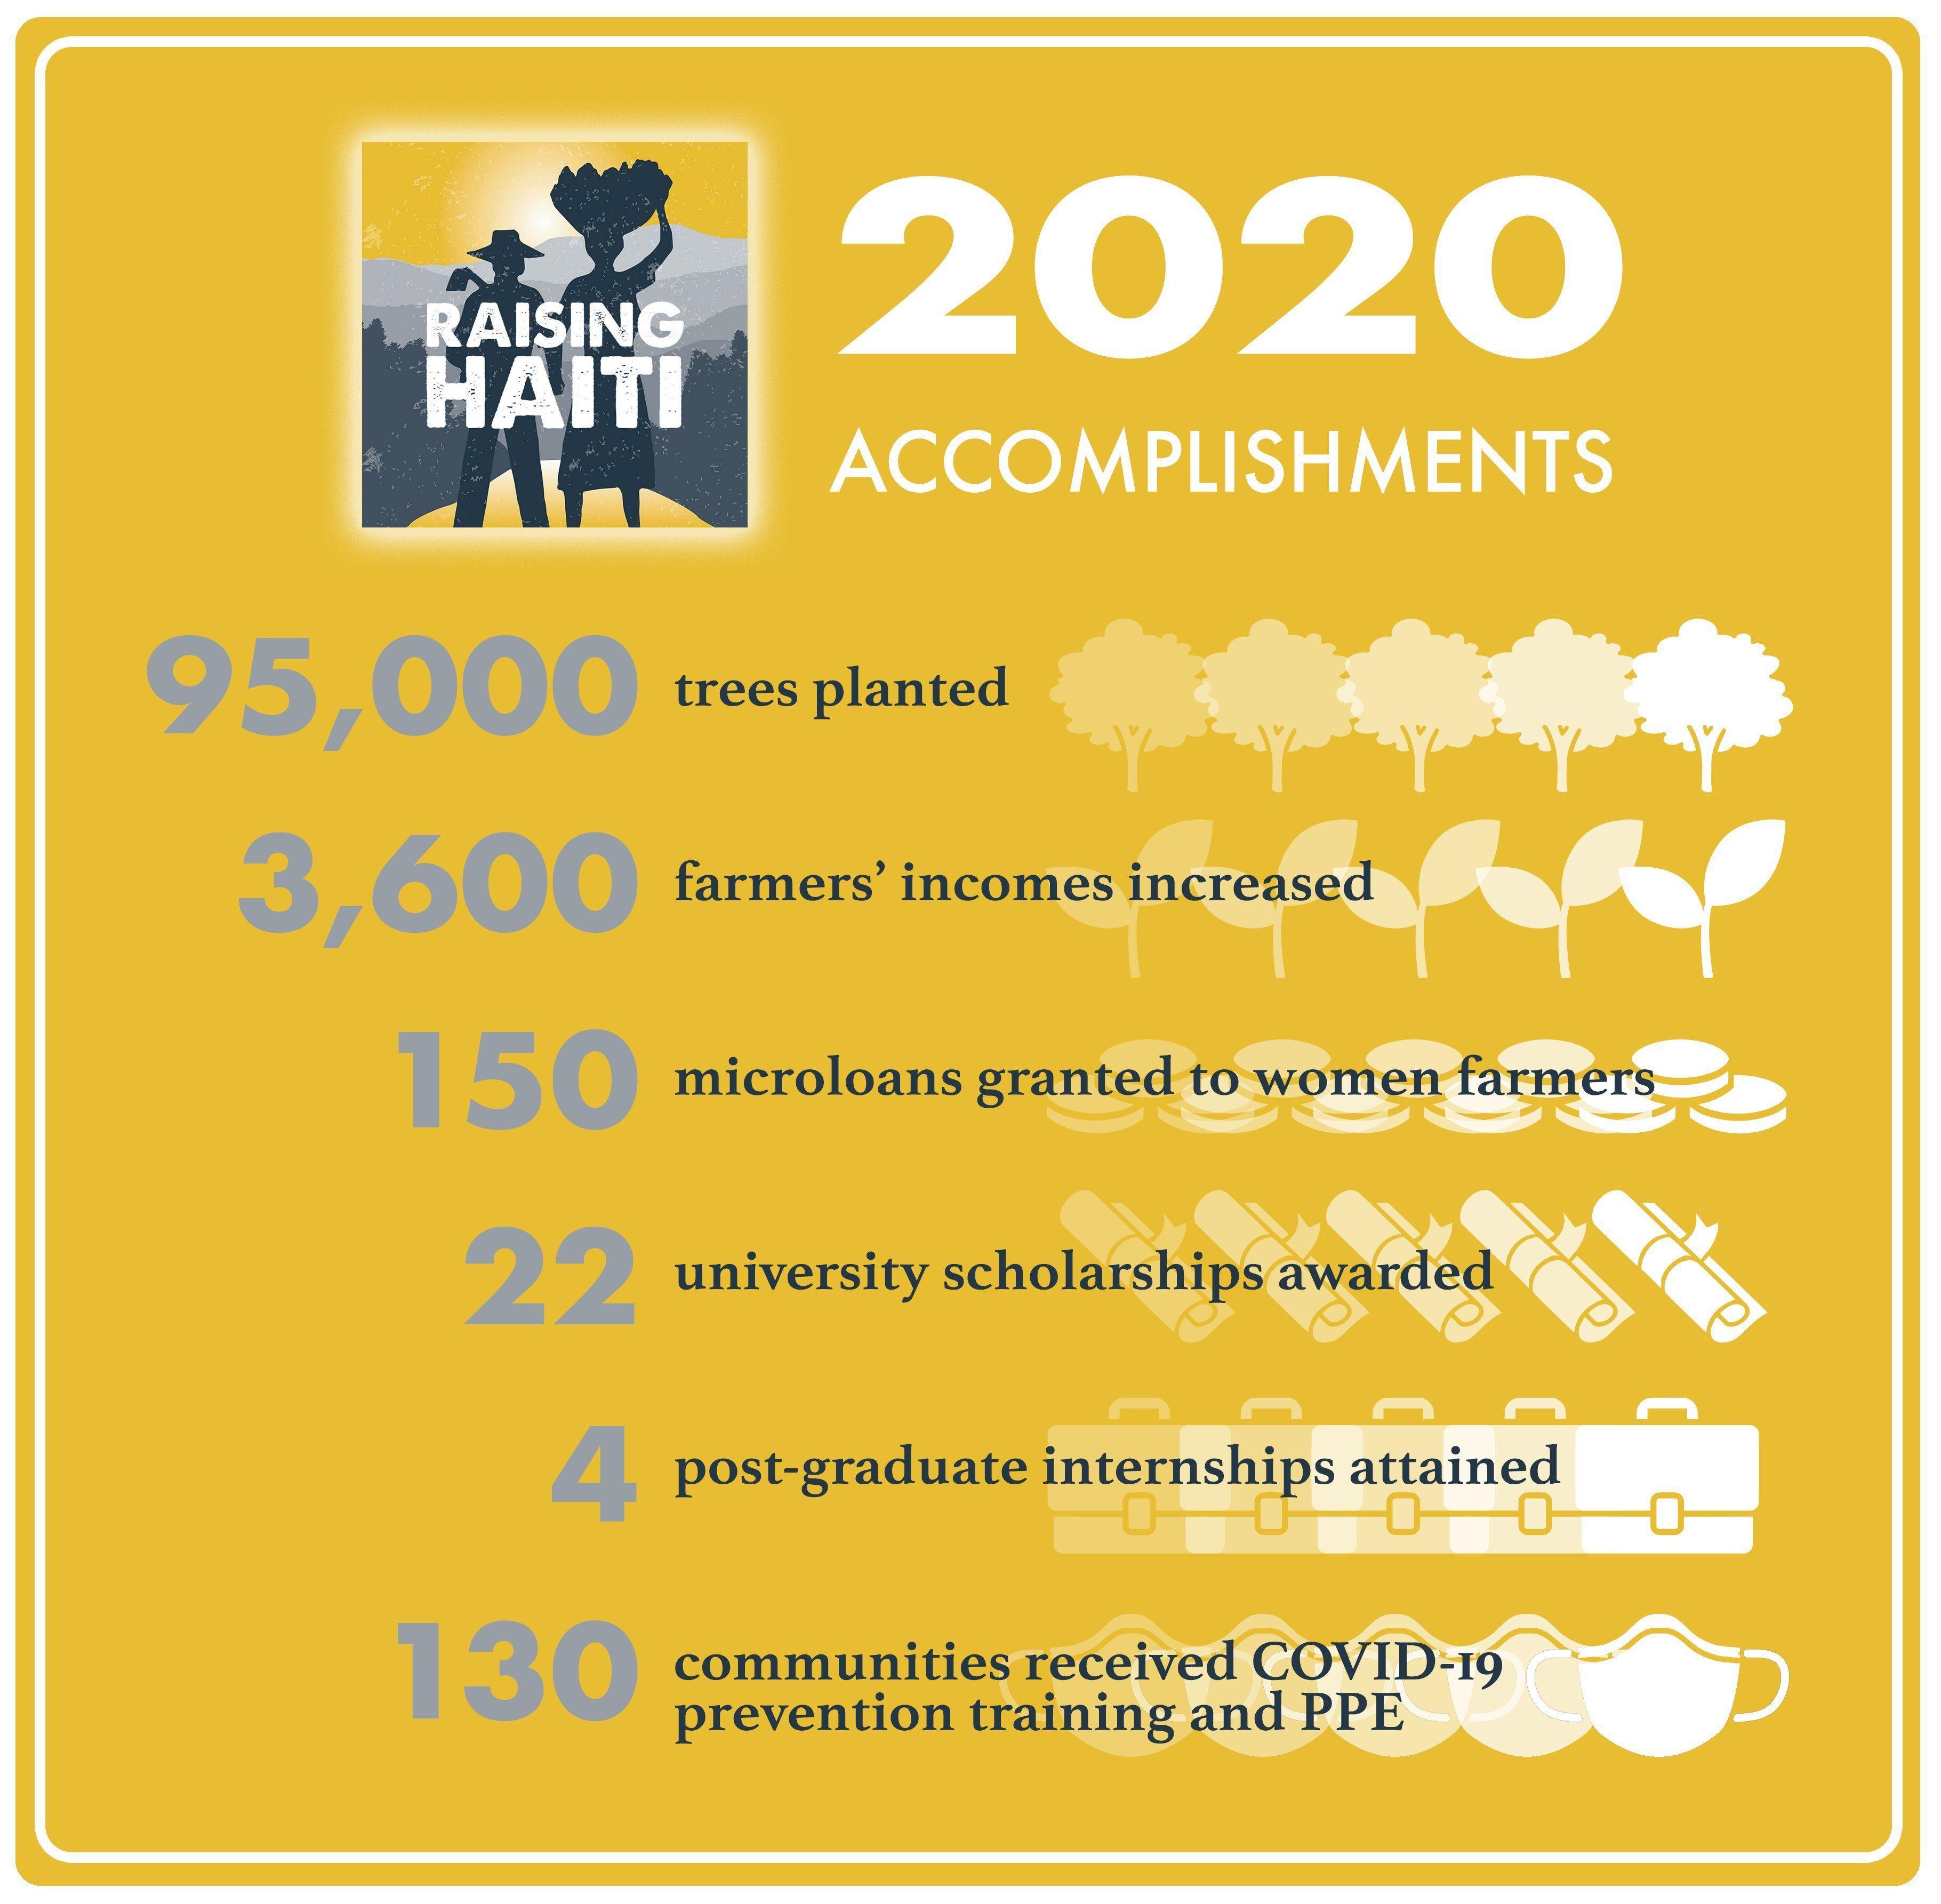 Raising Haiti Foundation 2020 Accomplishments